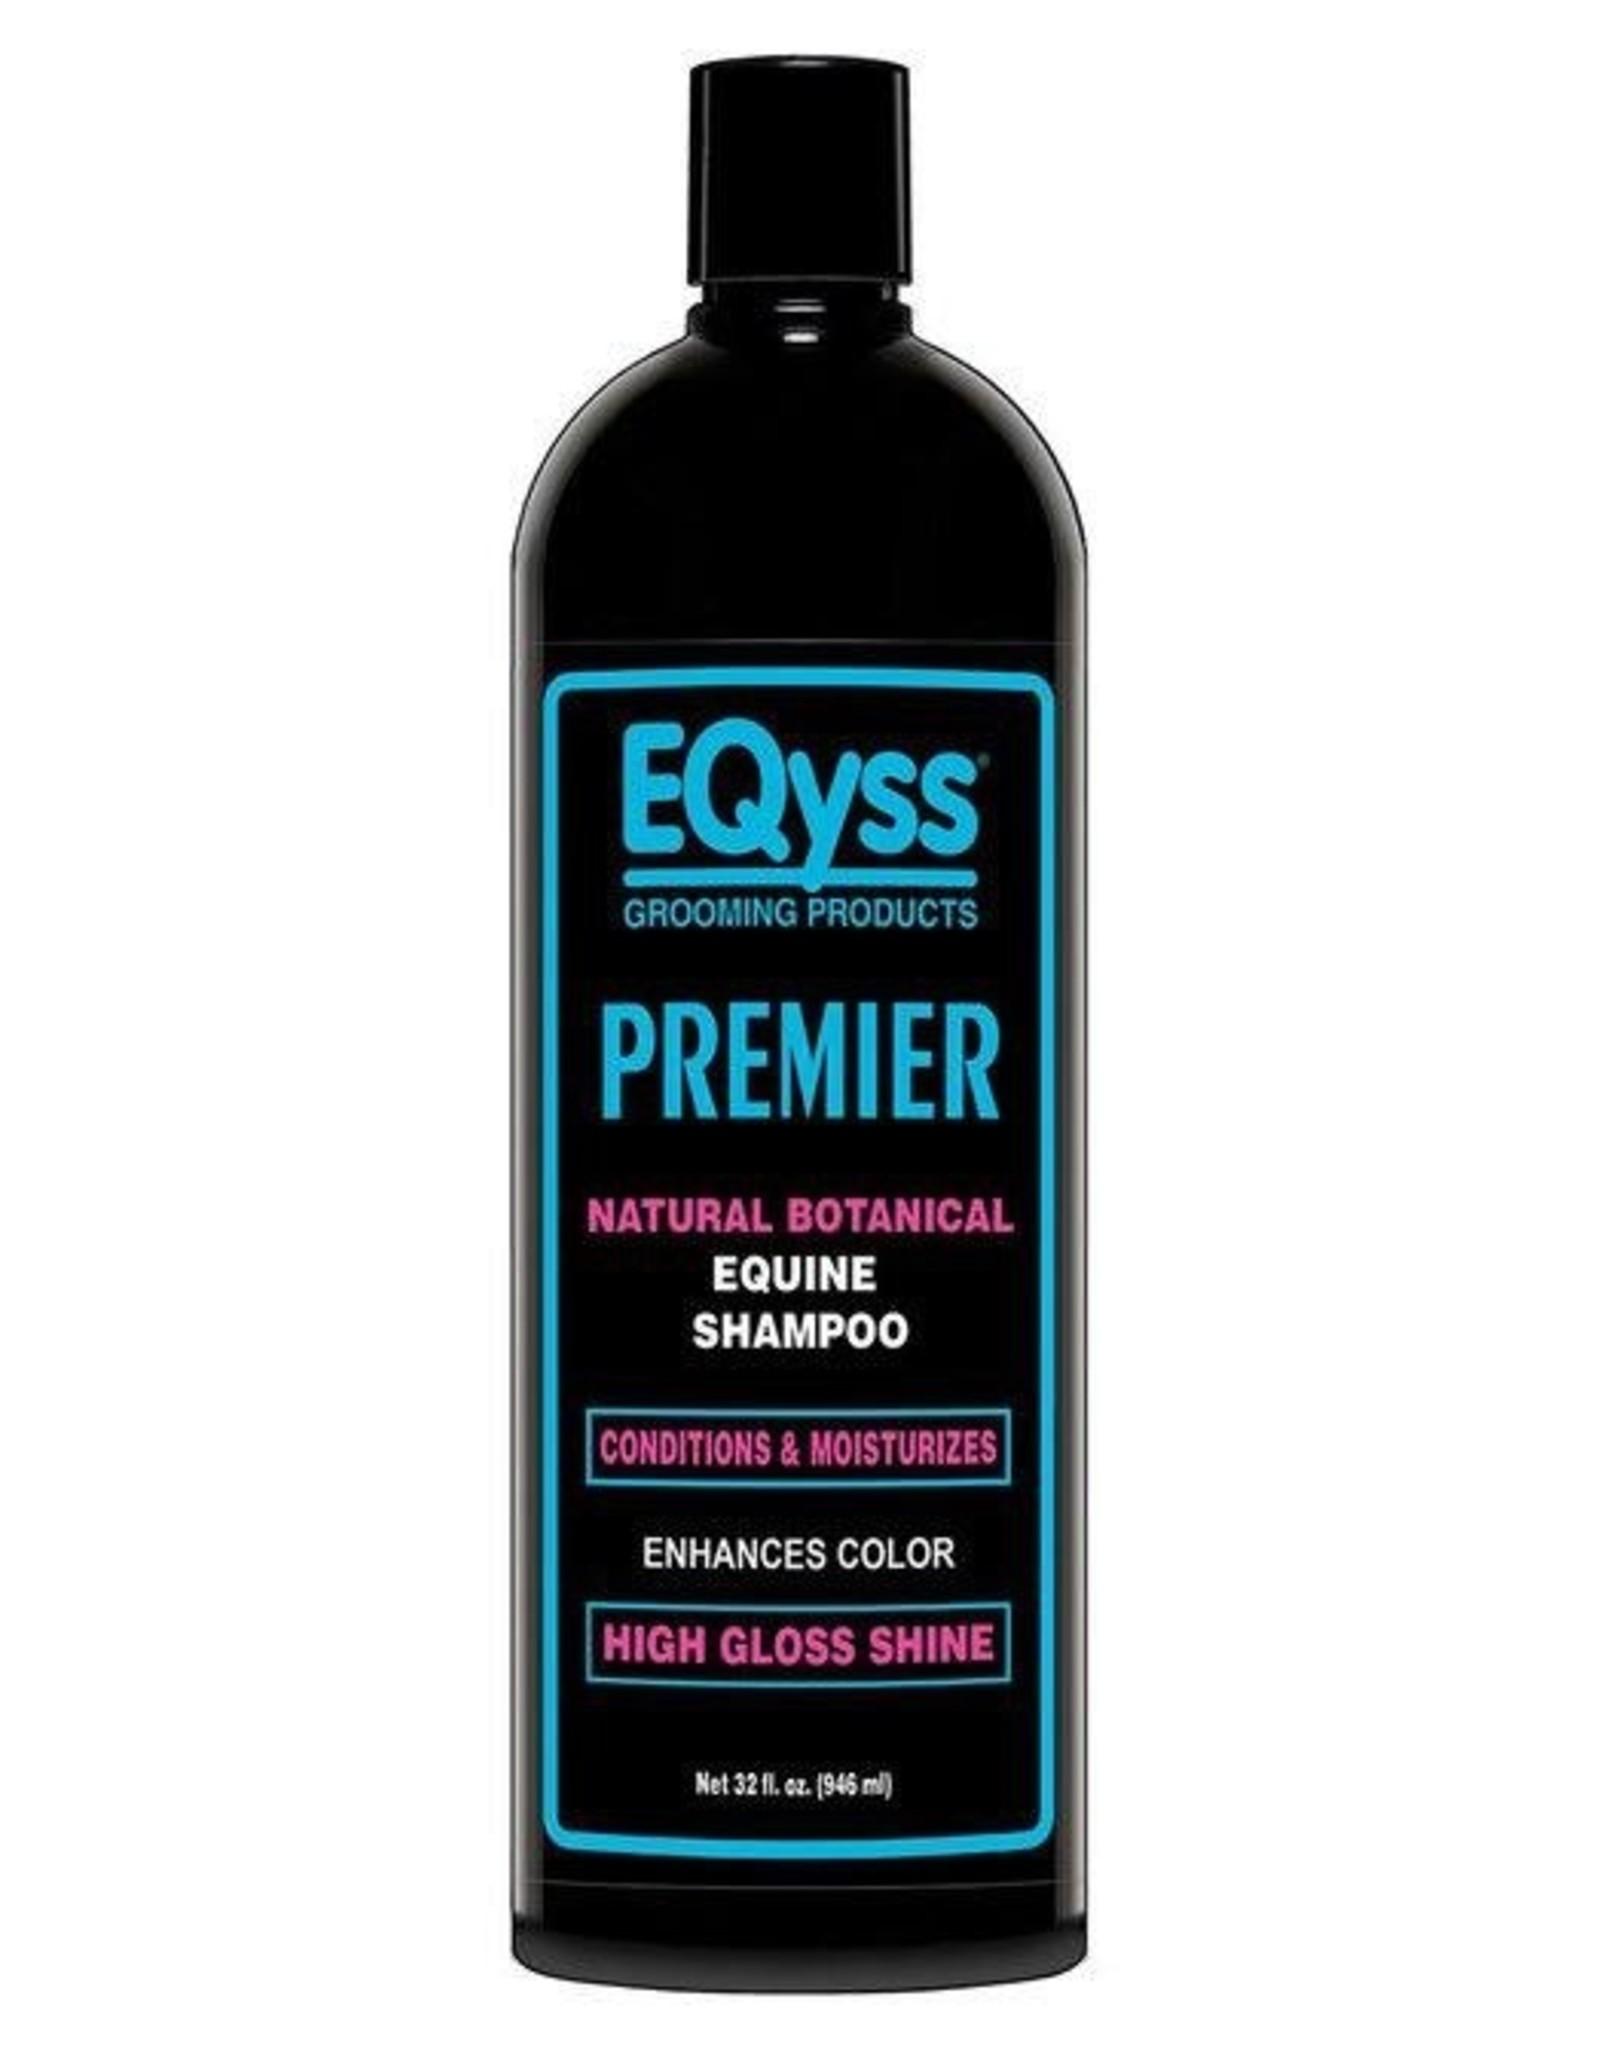 EQyss Premier Shampoo - 32oz